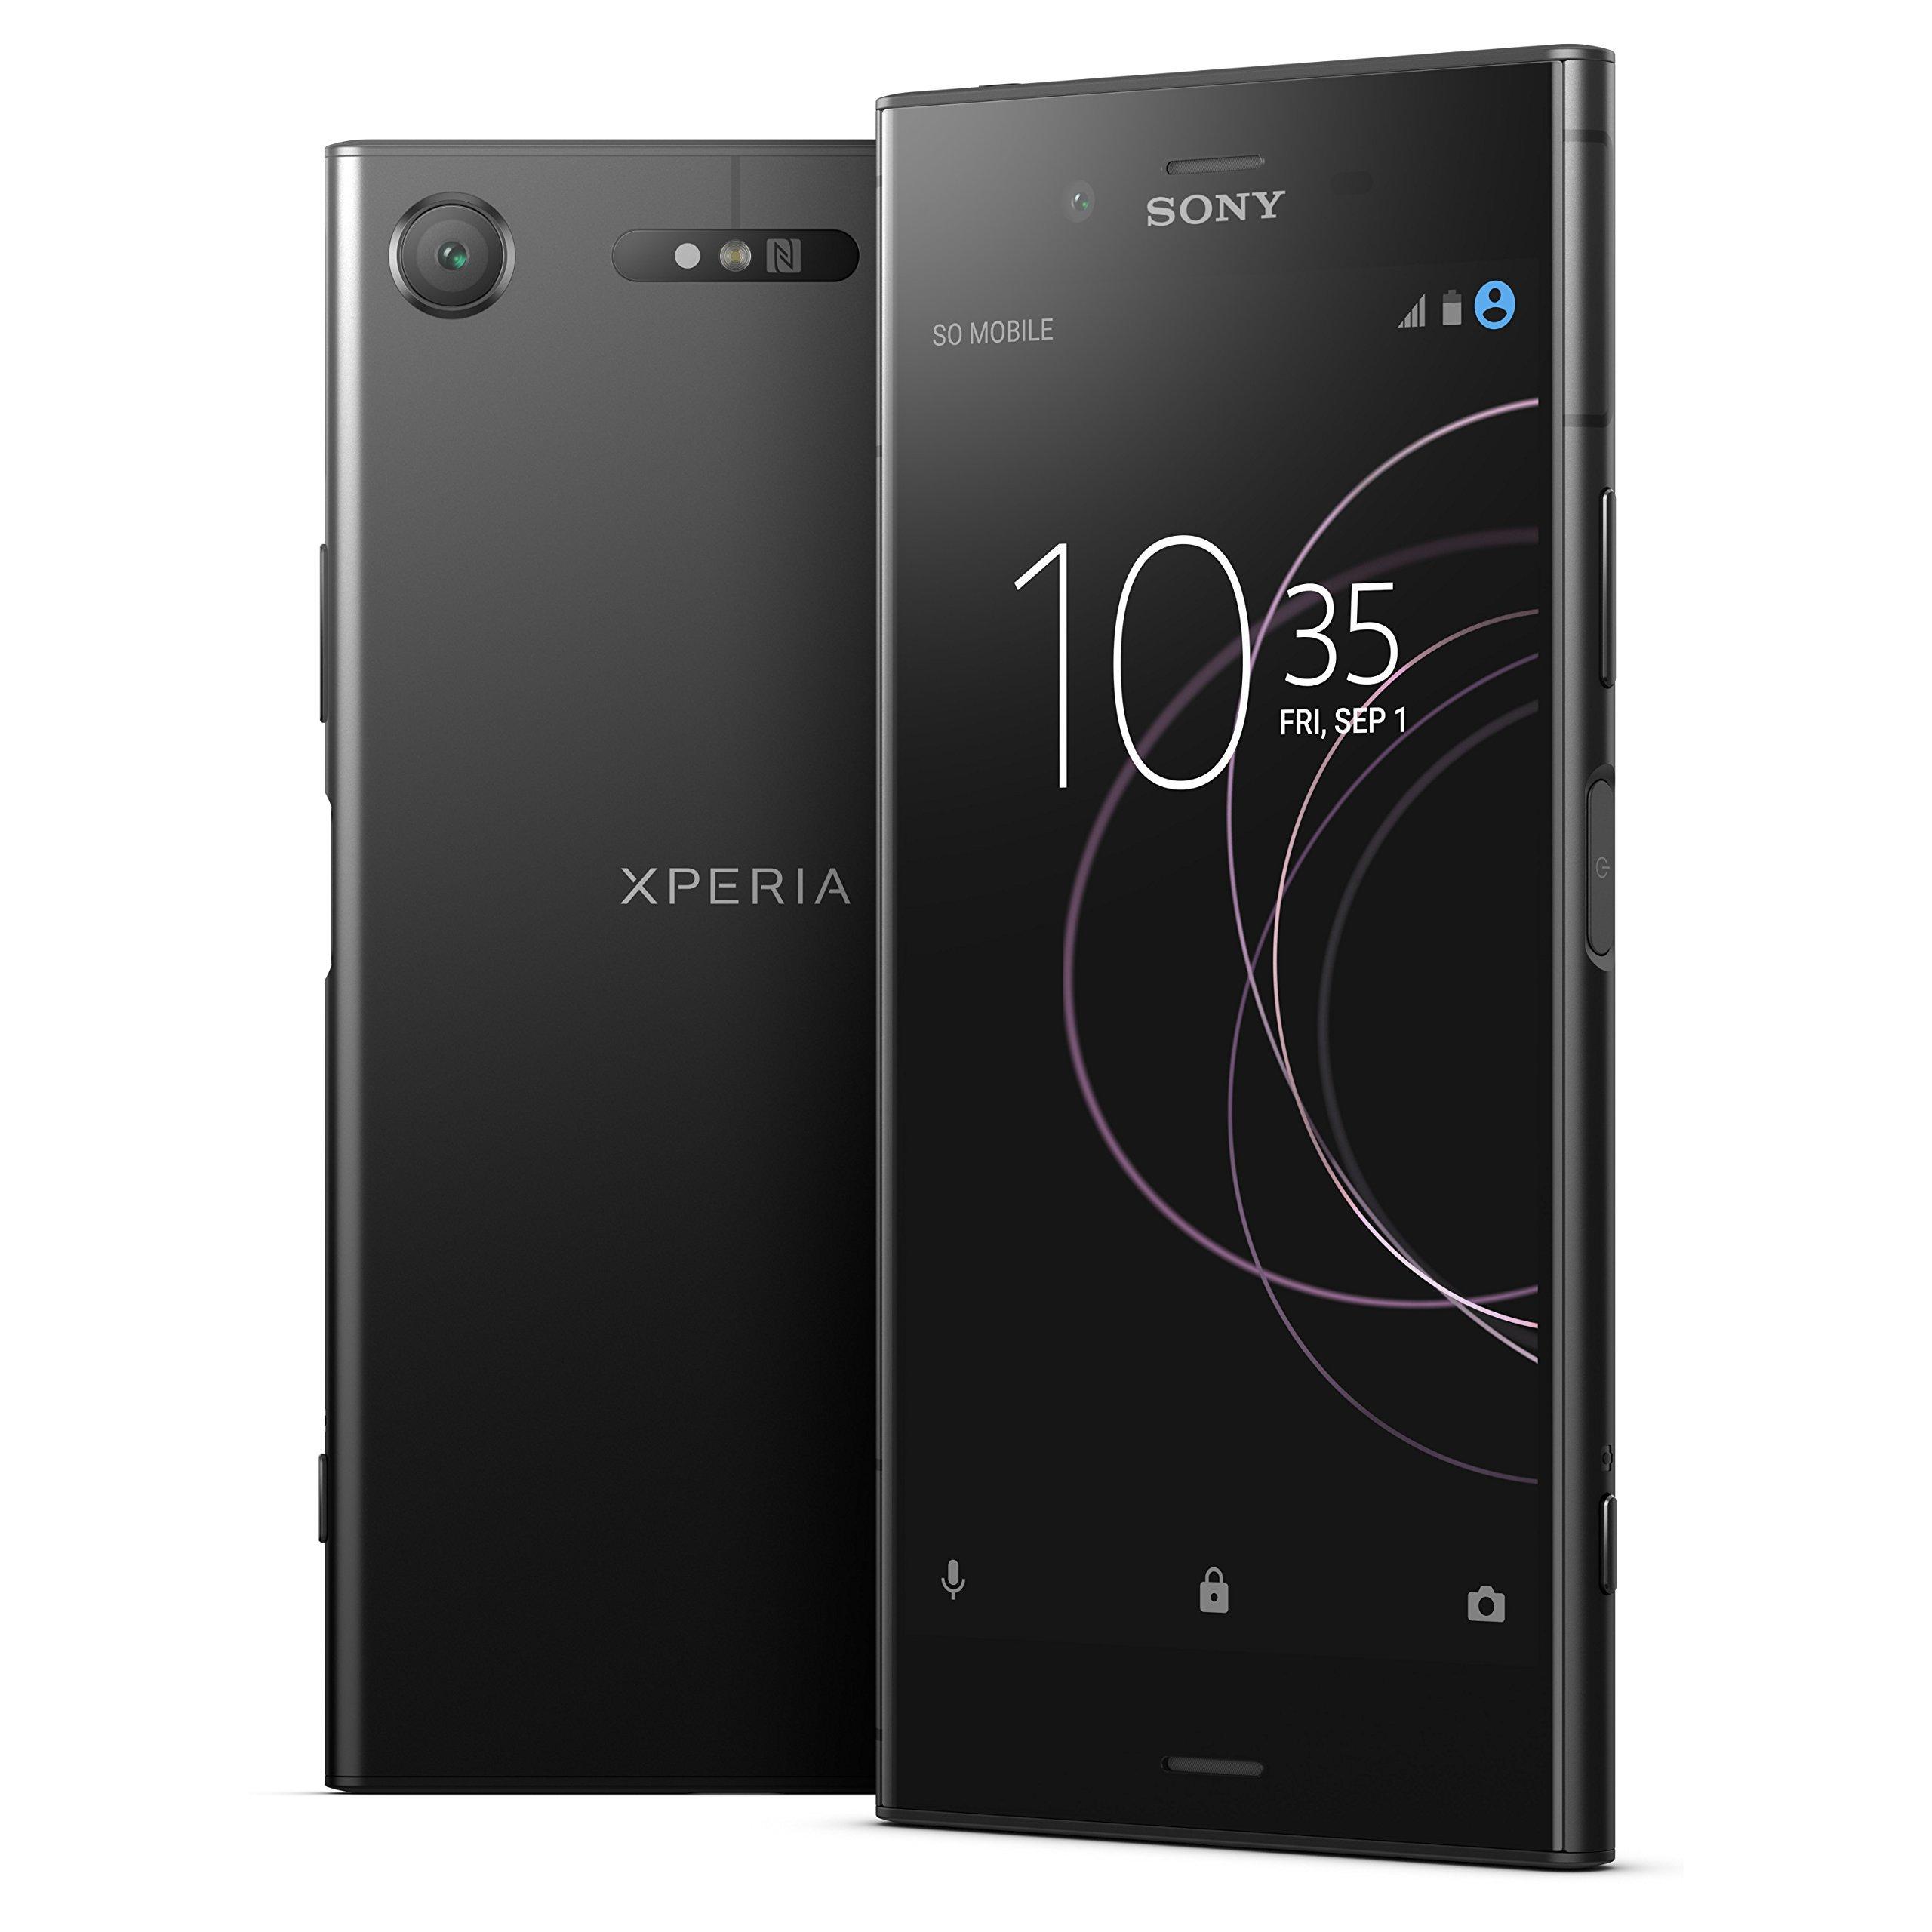 Sony Xperia XZ1 G8342 64GB Black, Dual Sim, 5.2in, GSM Unlocked International Model, No Warranty (Renewed)